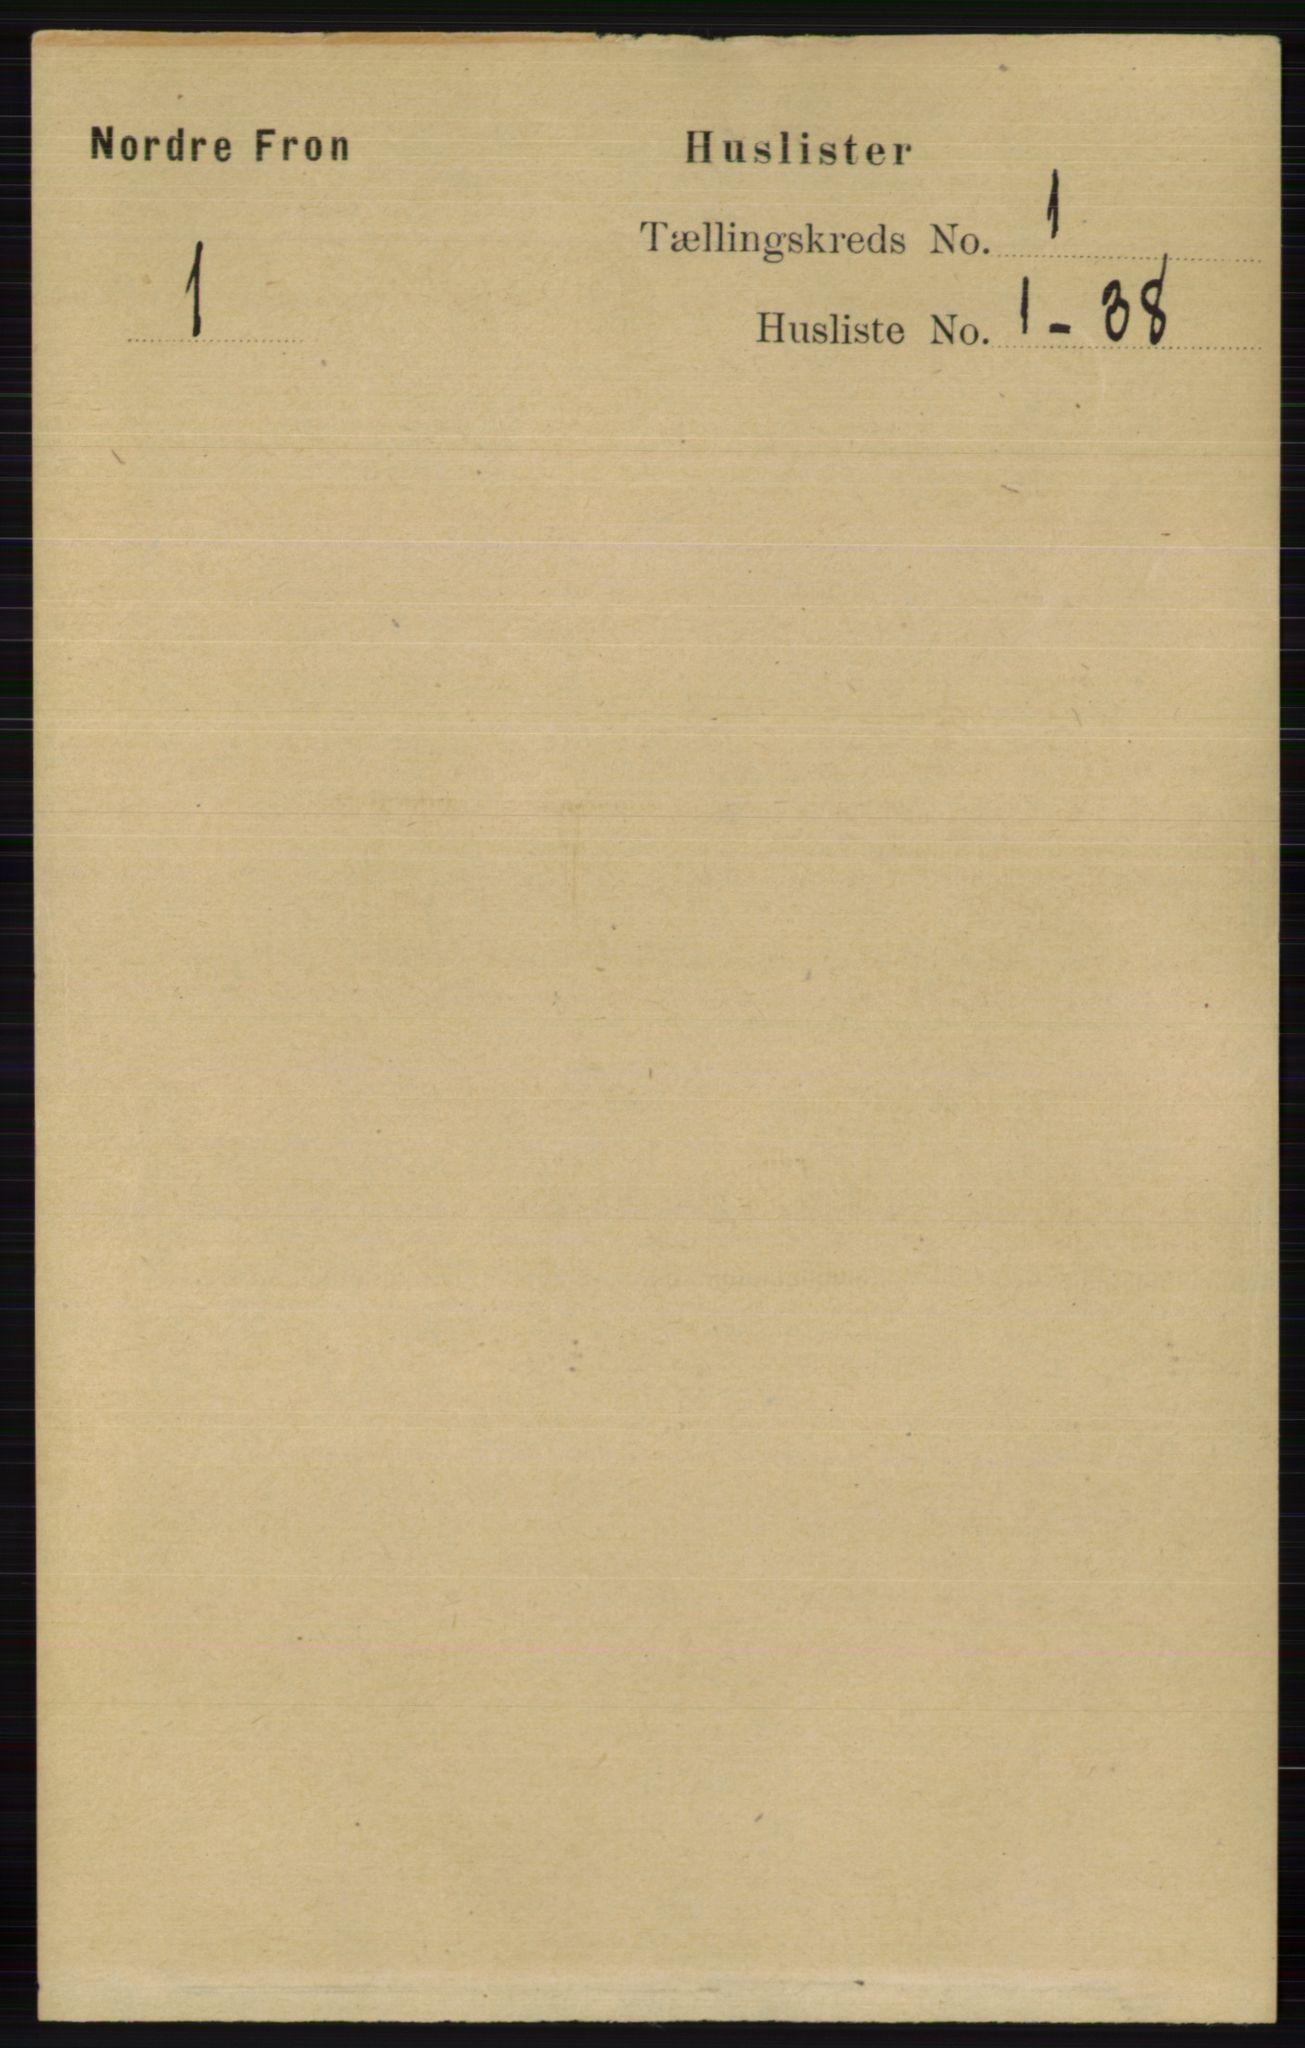 RA, Folketelling 1891 for 0518 Nord-Fron herred, 1891, s. 34